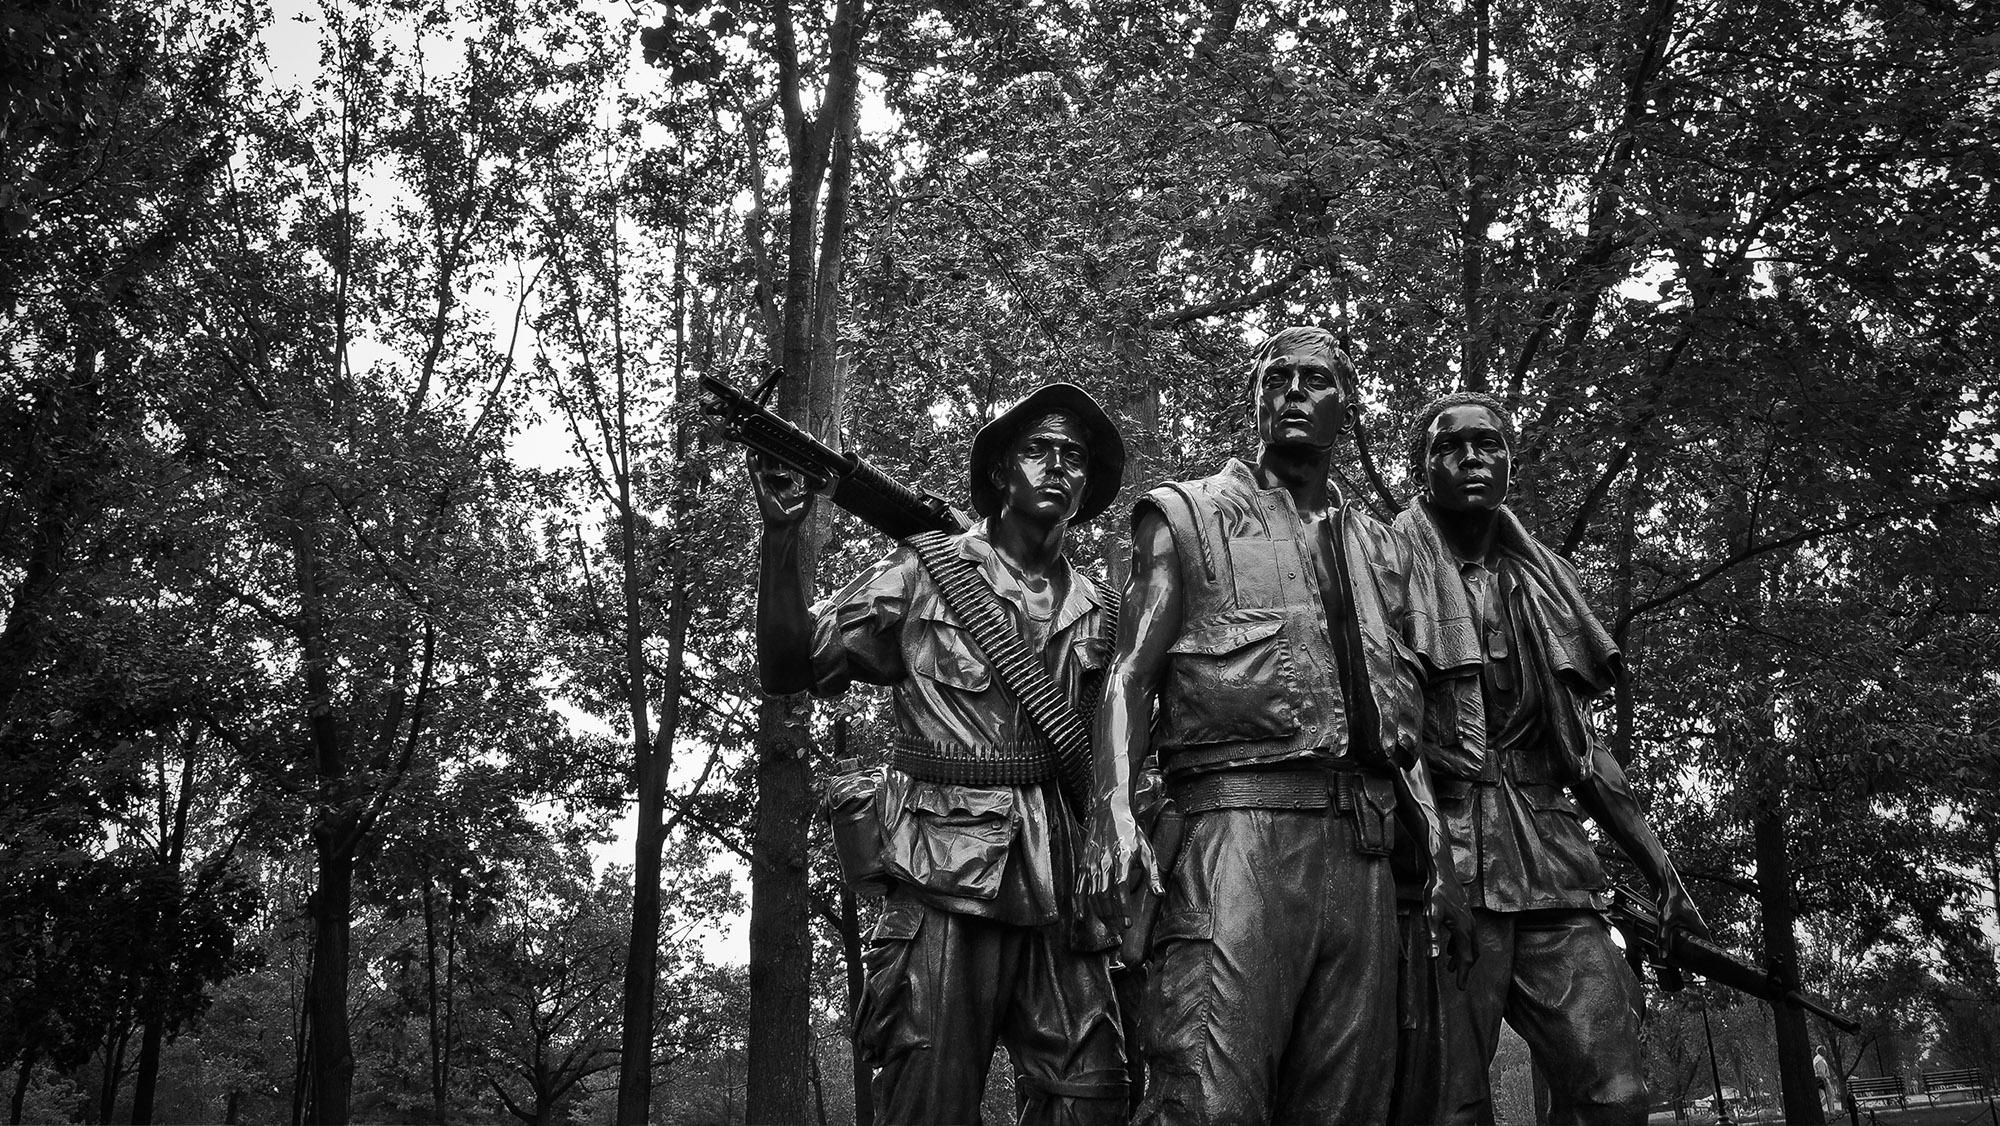 Three Soldiers Statue, Washington, D.C.